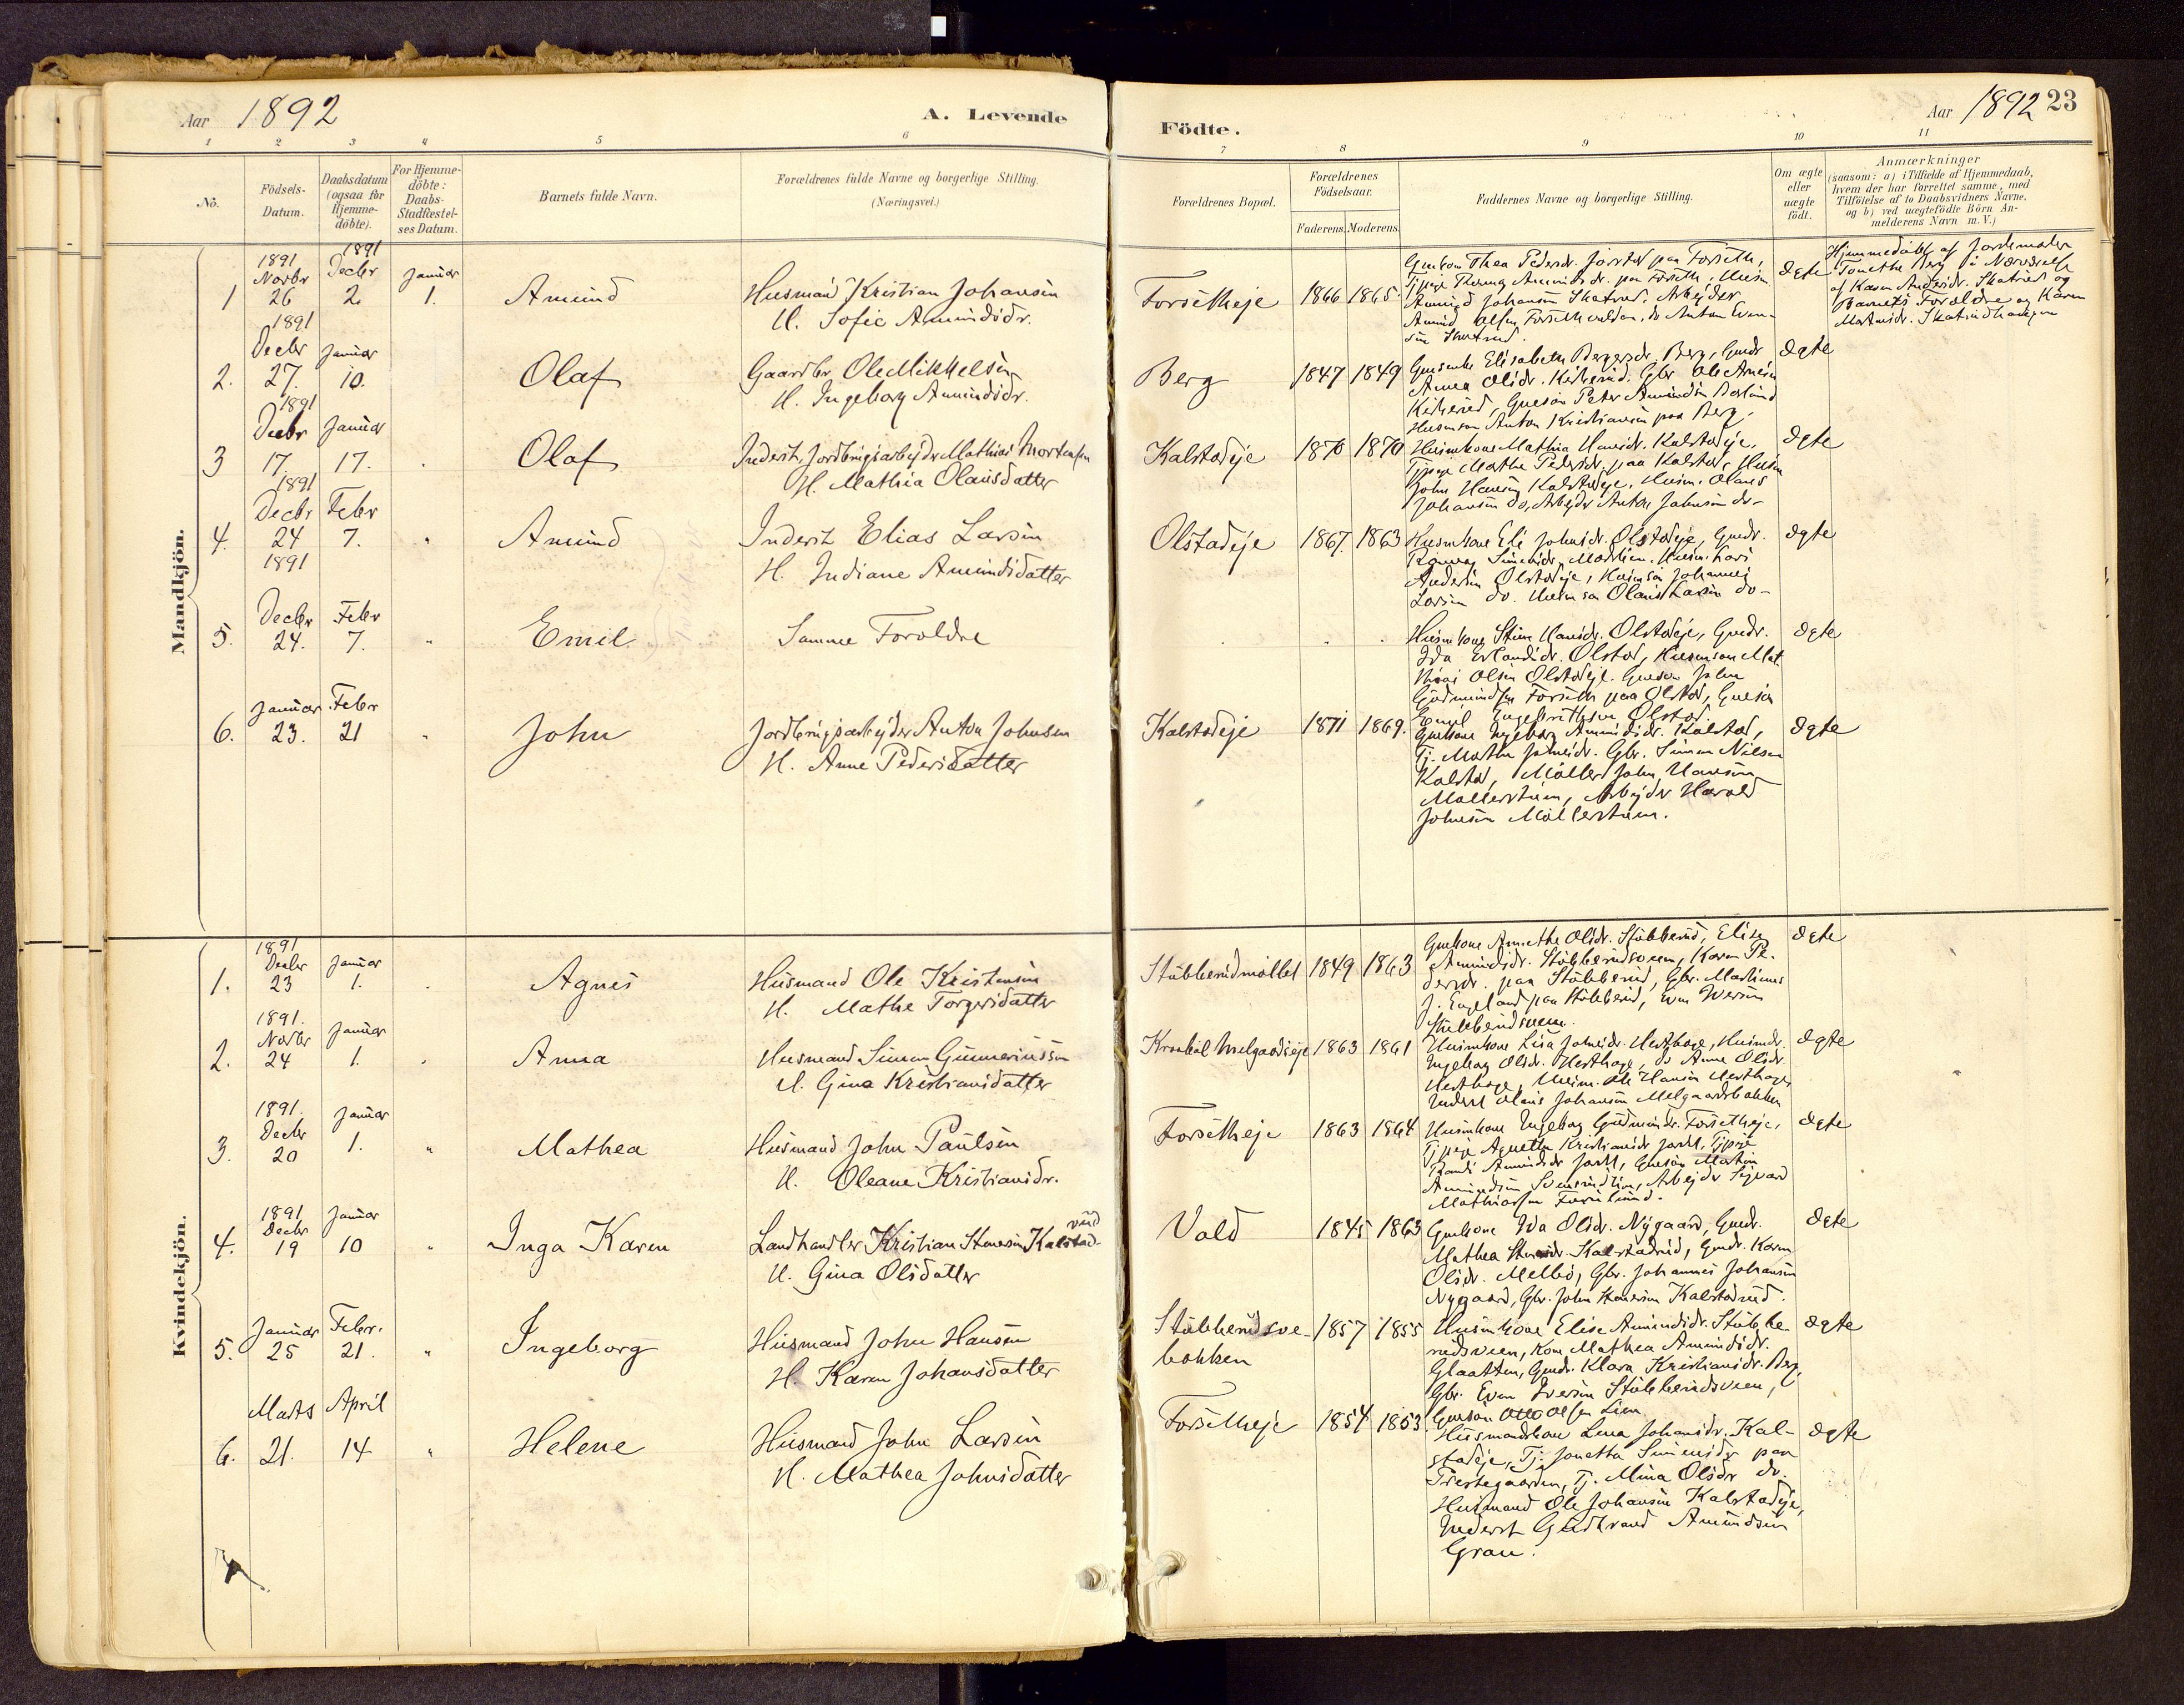 SAH, Vestre Gausdal prestekontor, Ministerialbok nr. 1, 1887-1914, s. 23